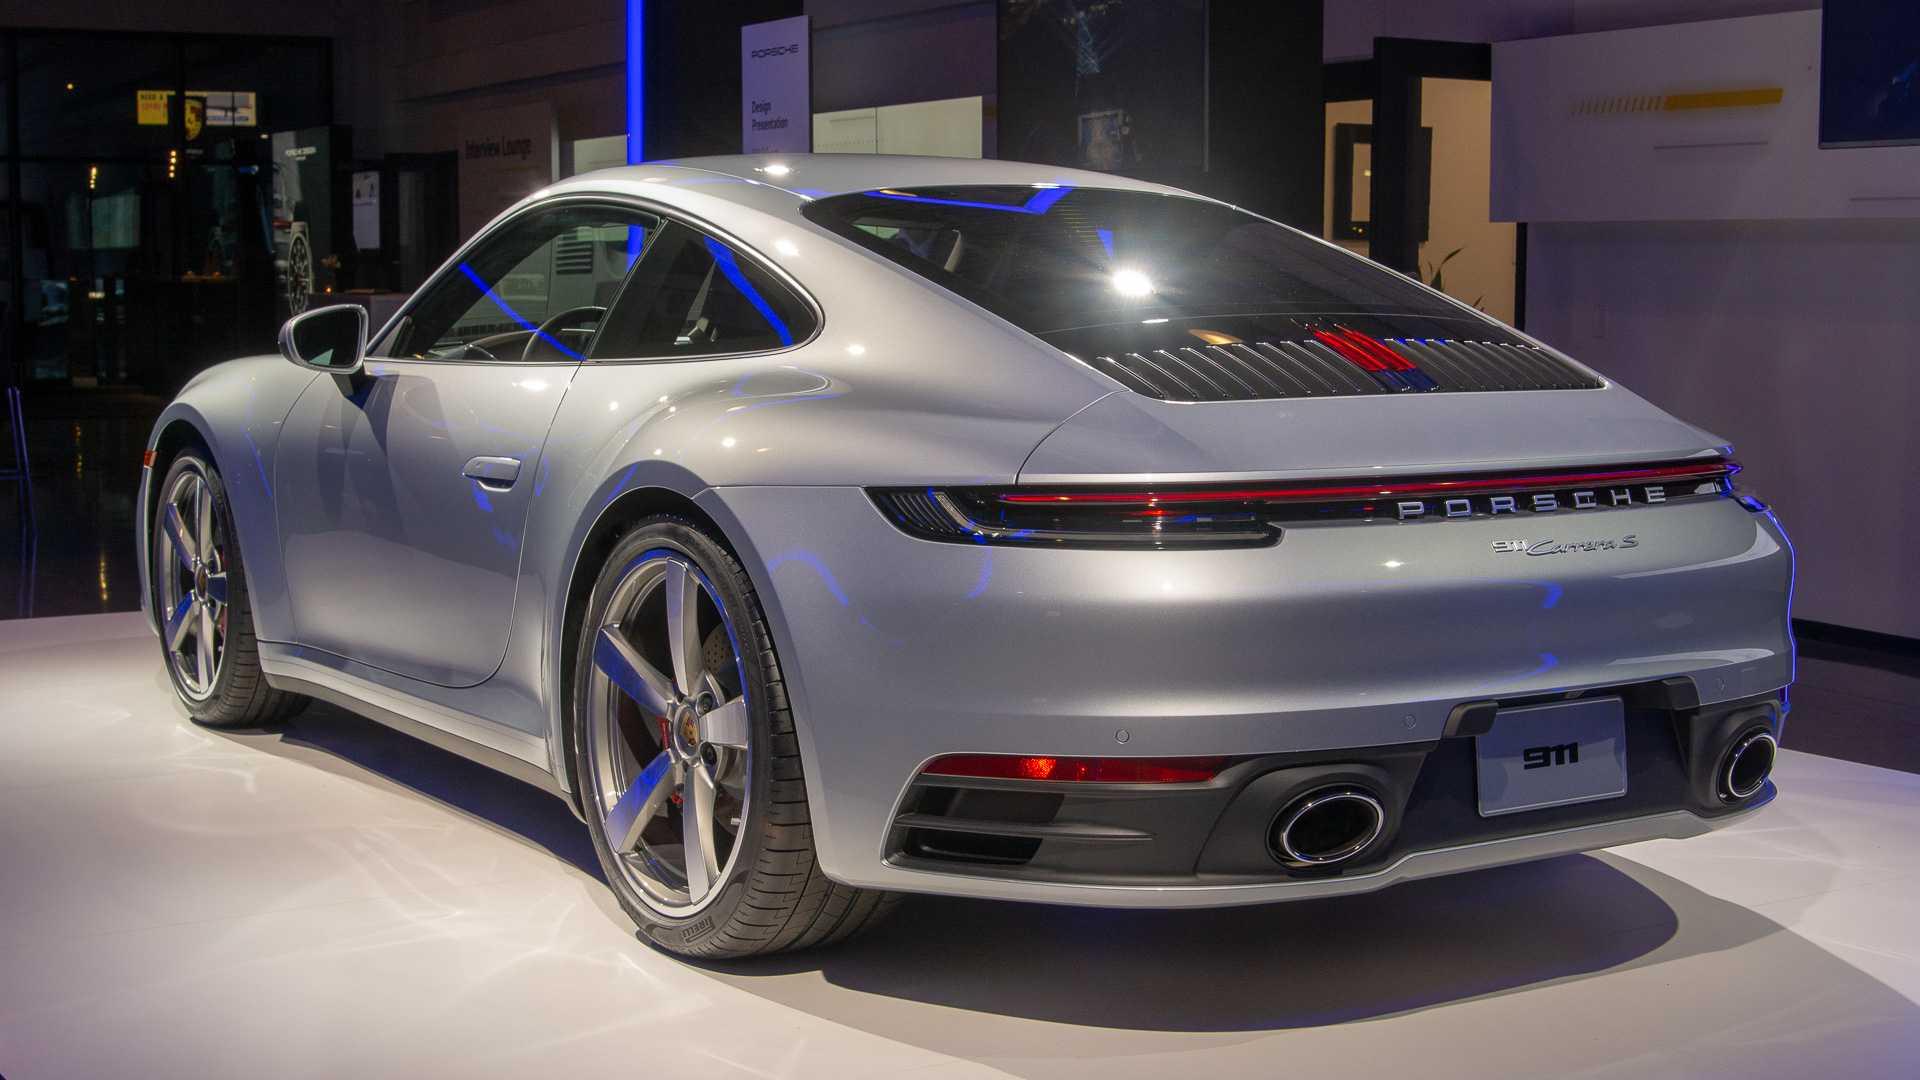 2020-porsche-911-carrera-s-1.jpg